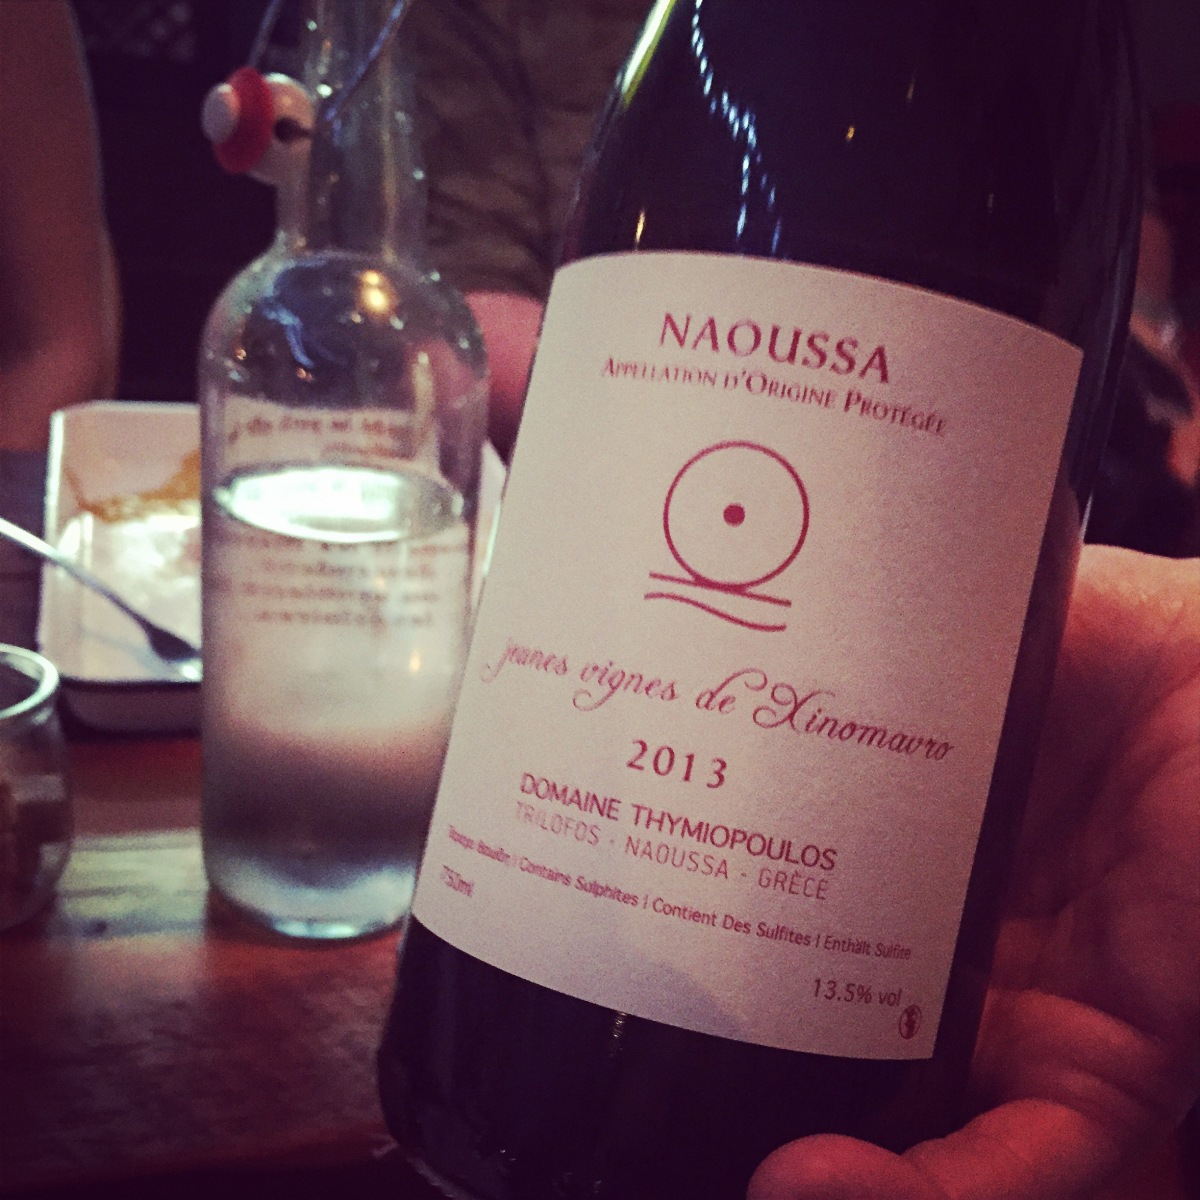 Domaine Thymiopoulos Jeunes Vignes de Xinomavro Naoussa 2013